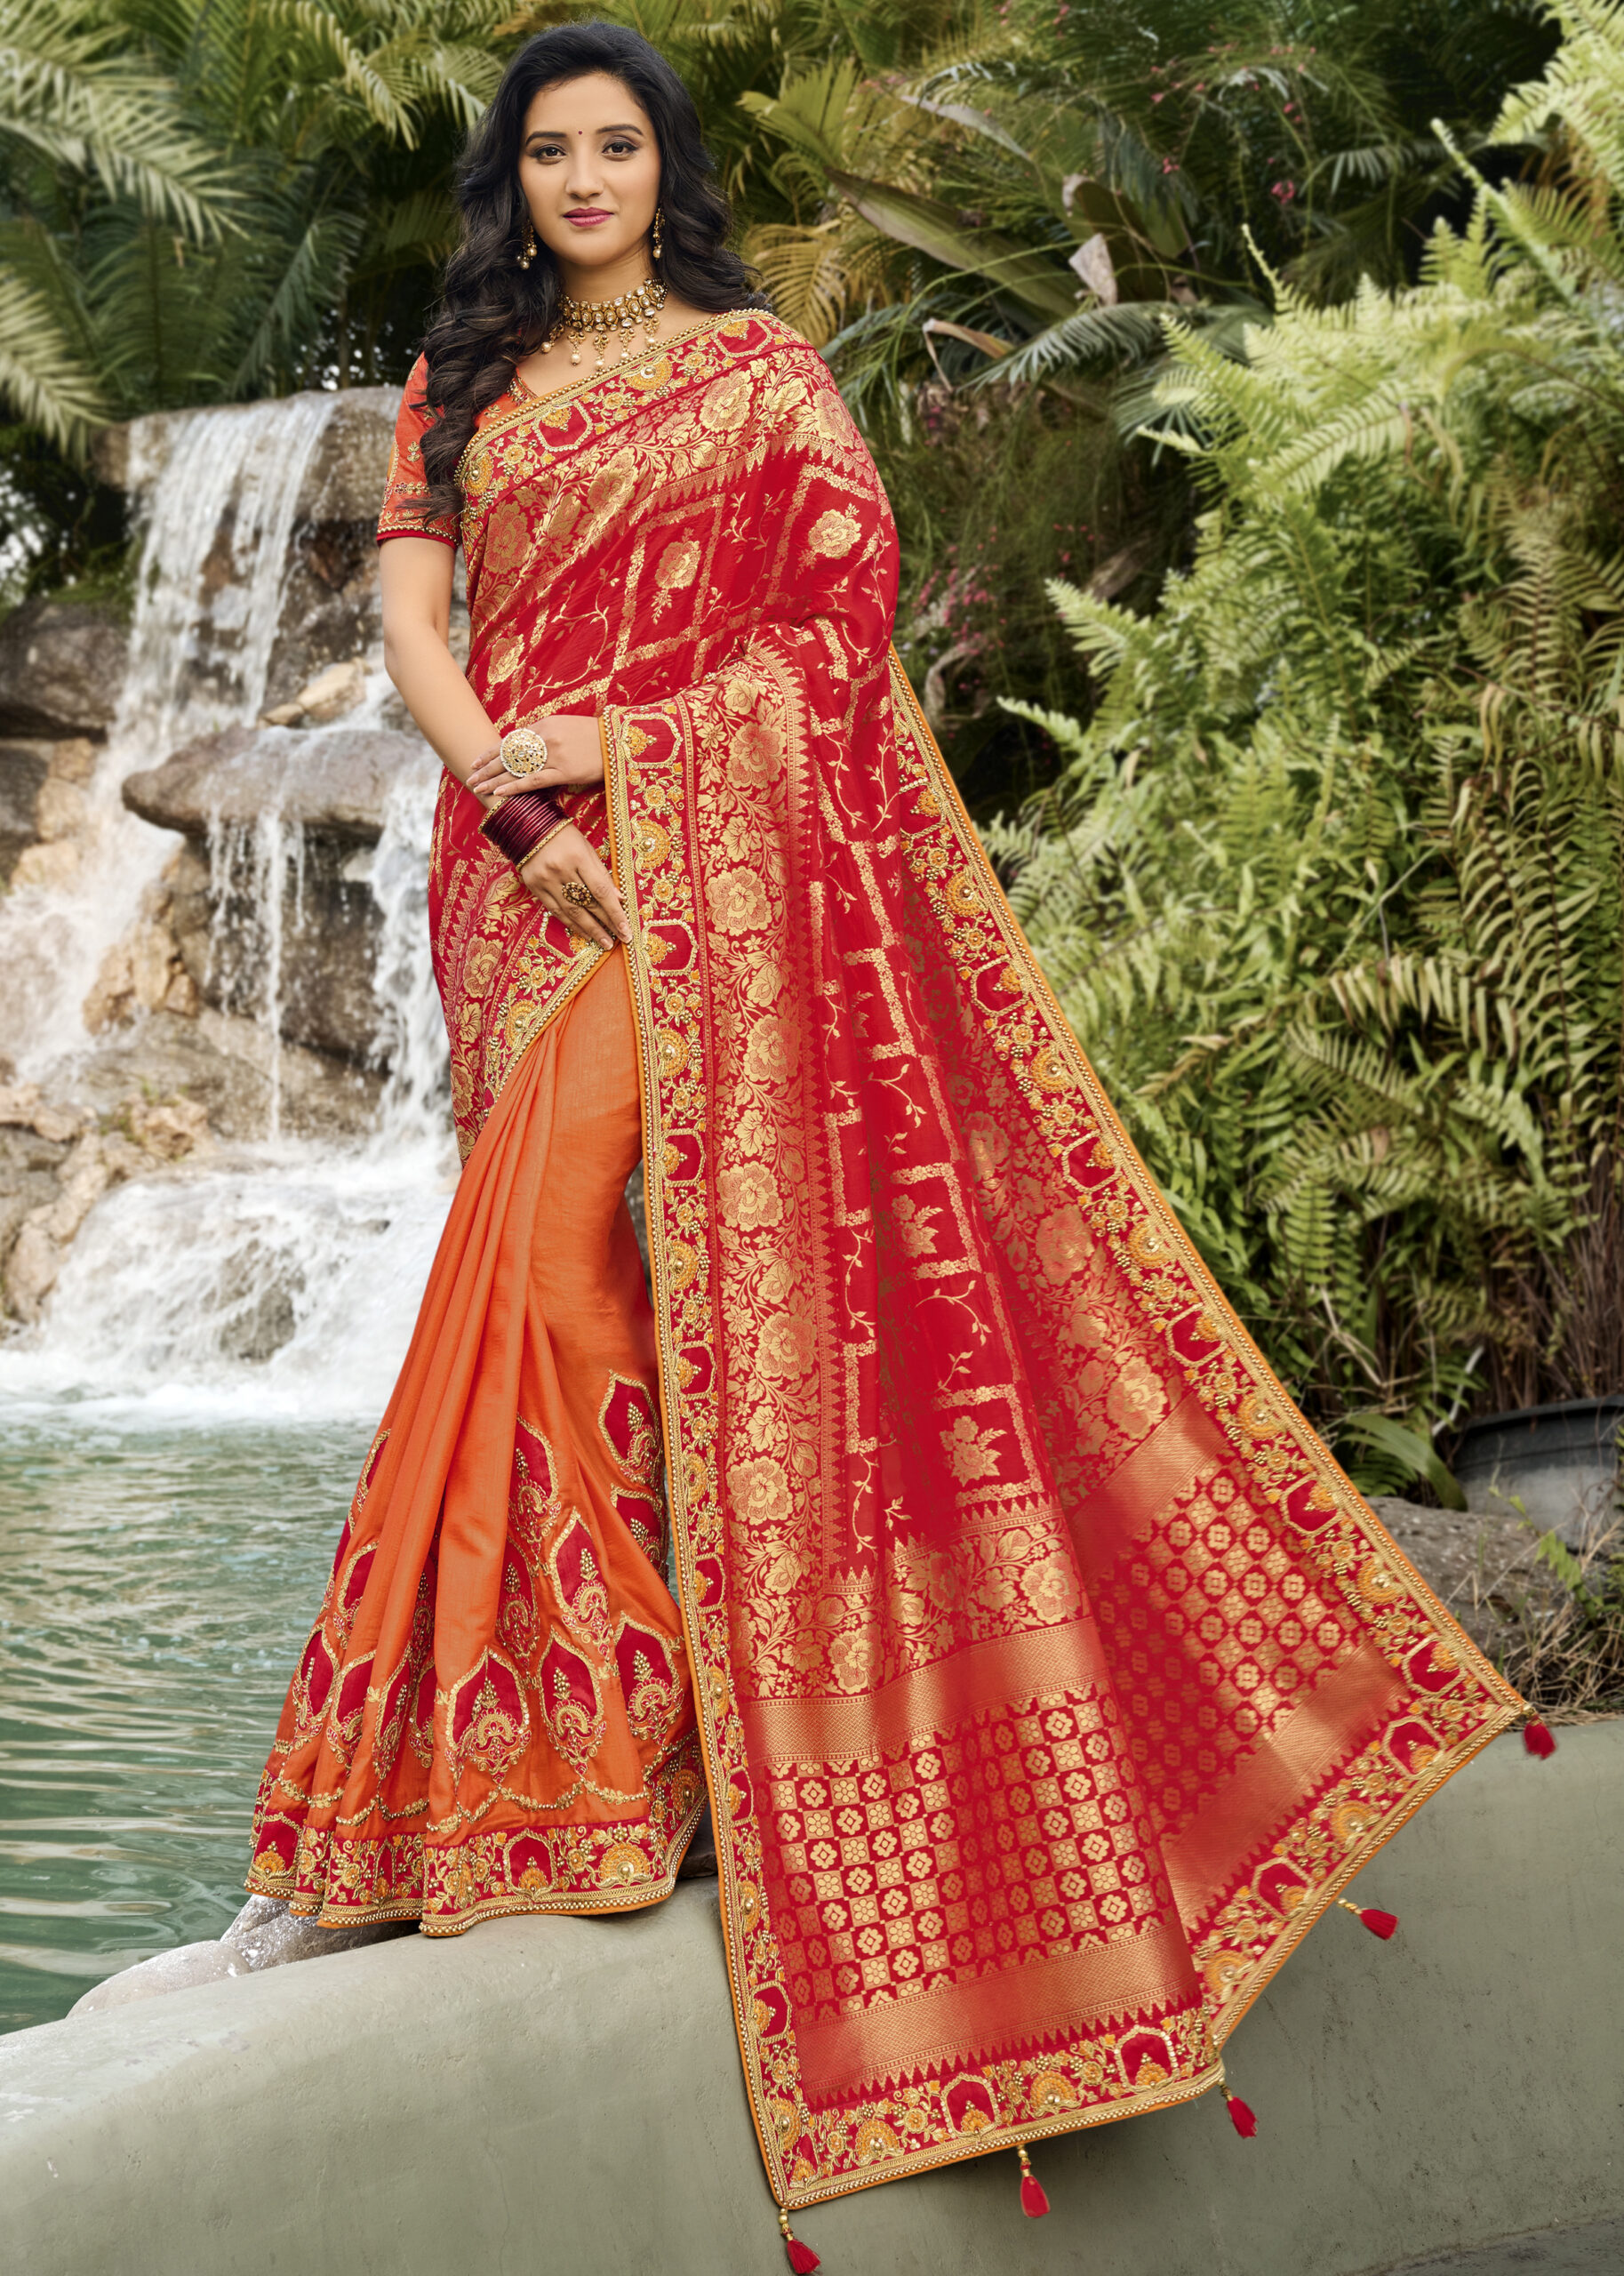 Chilli Red Pattu Saree with Golden Border